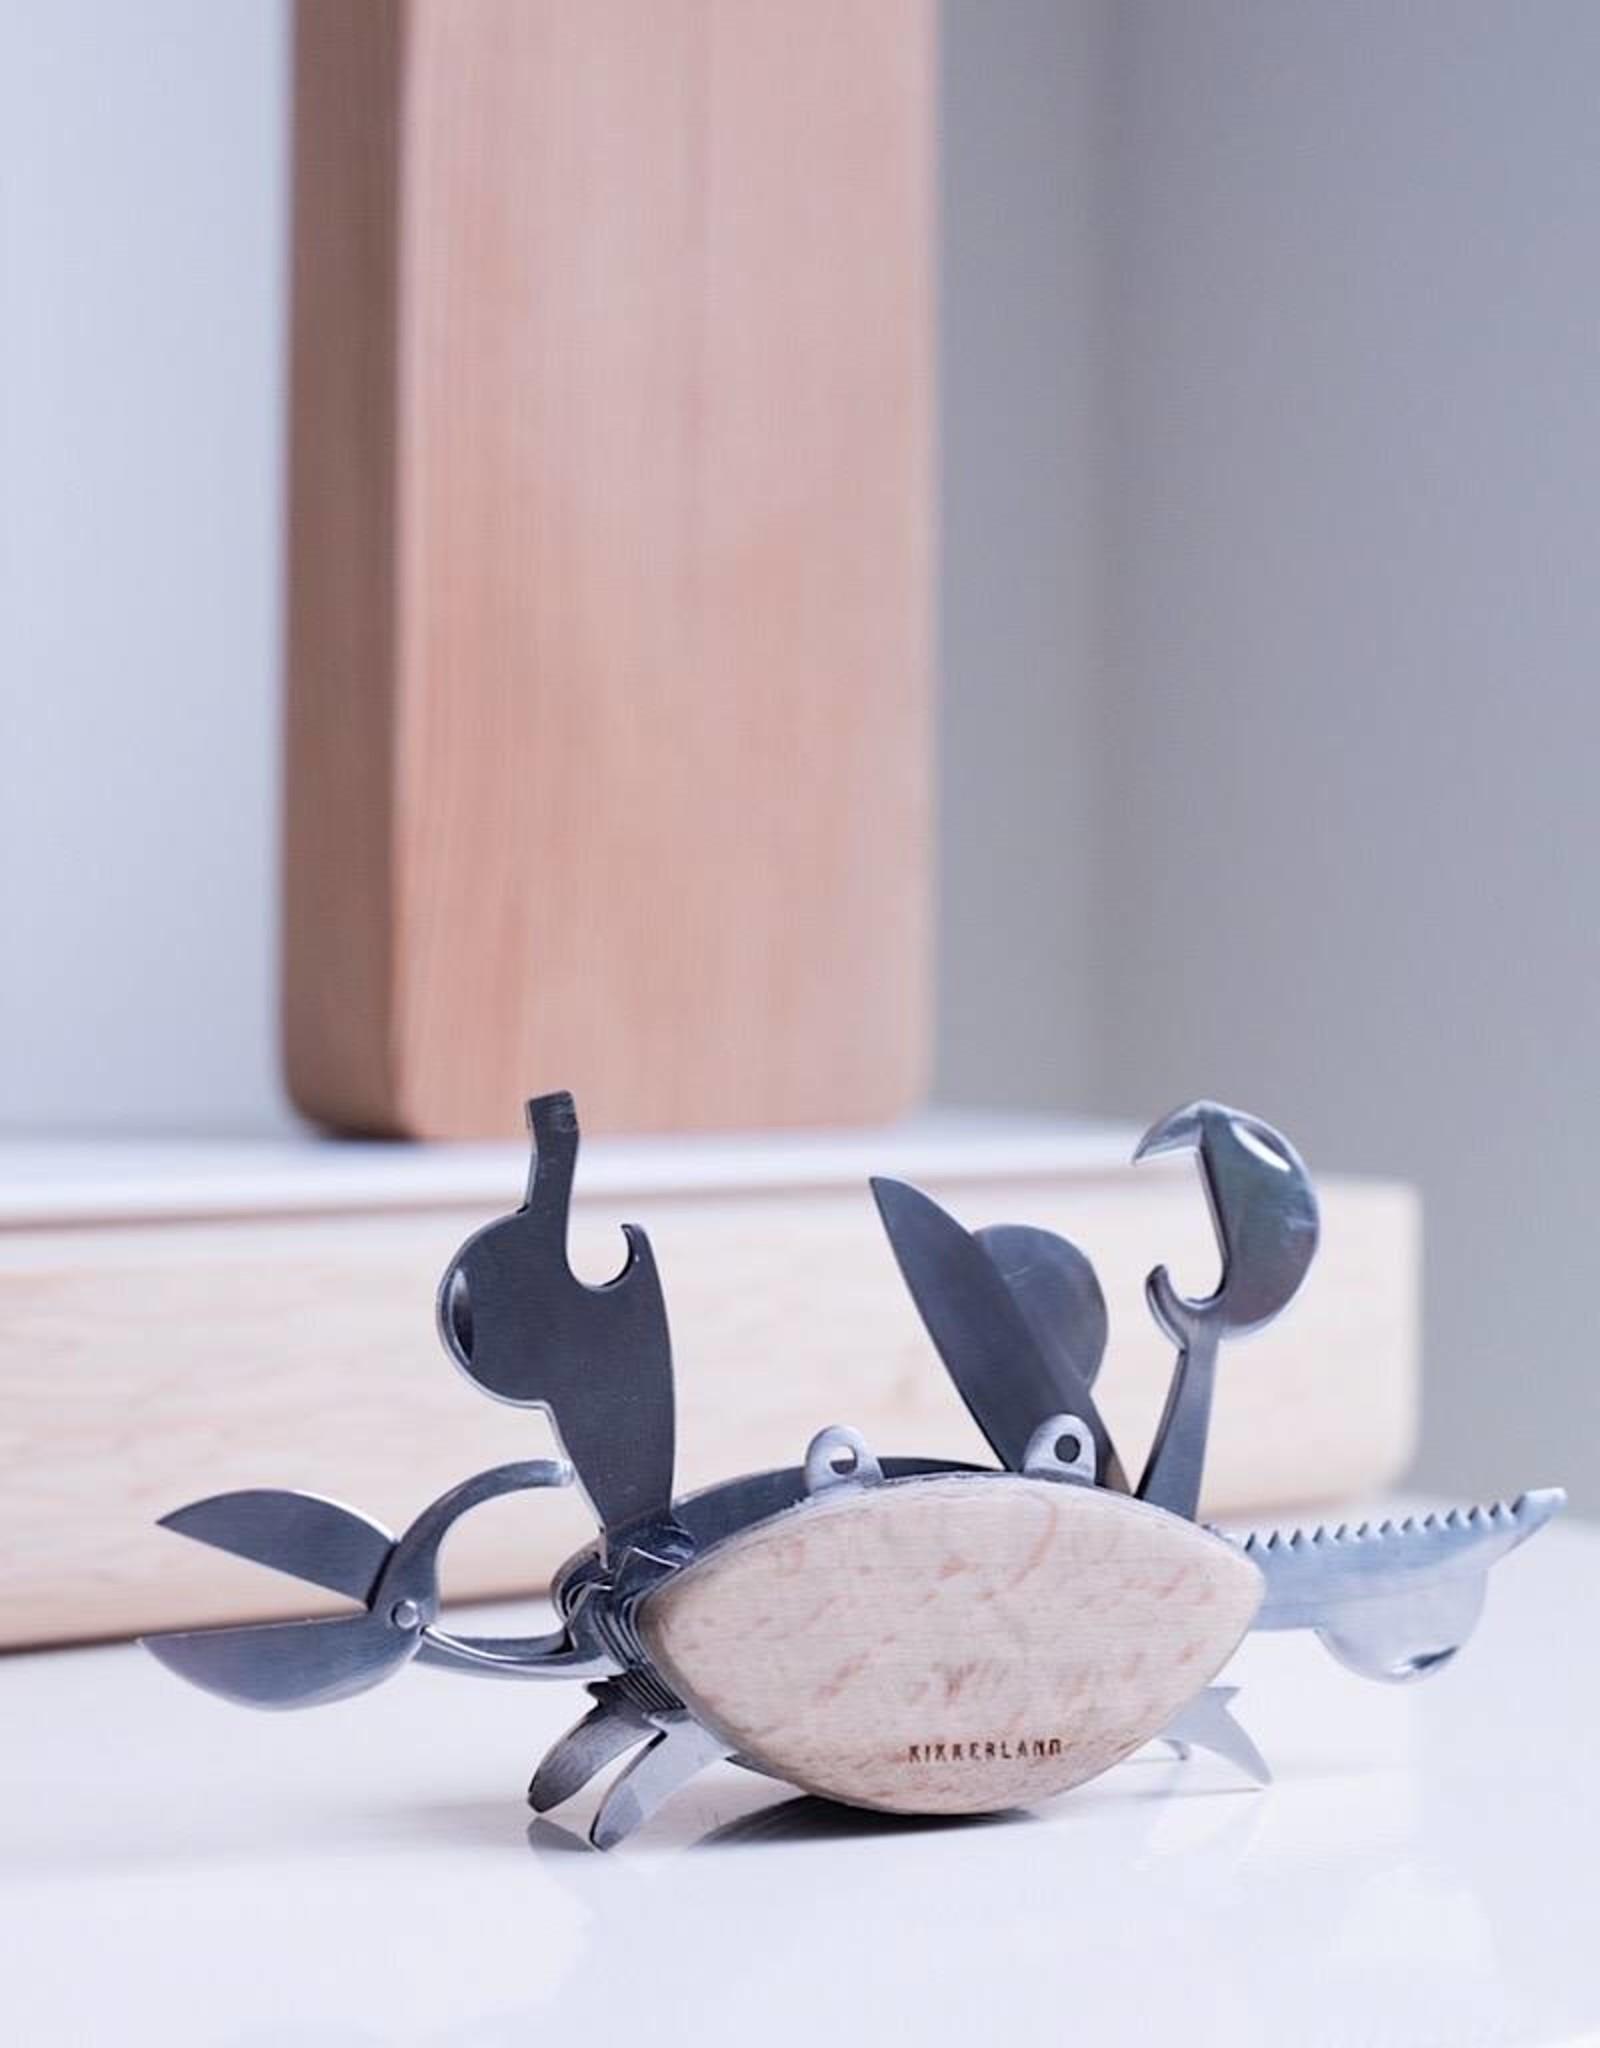 Kikkerland CD114 Crab Multi Tool